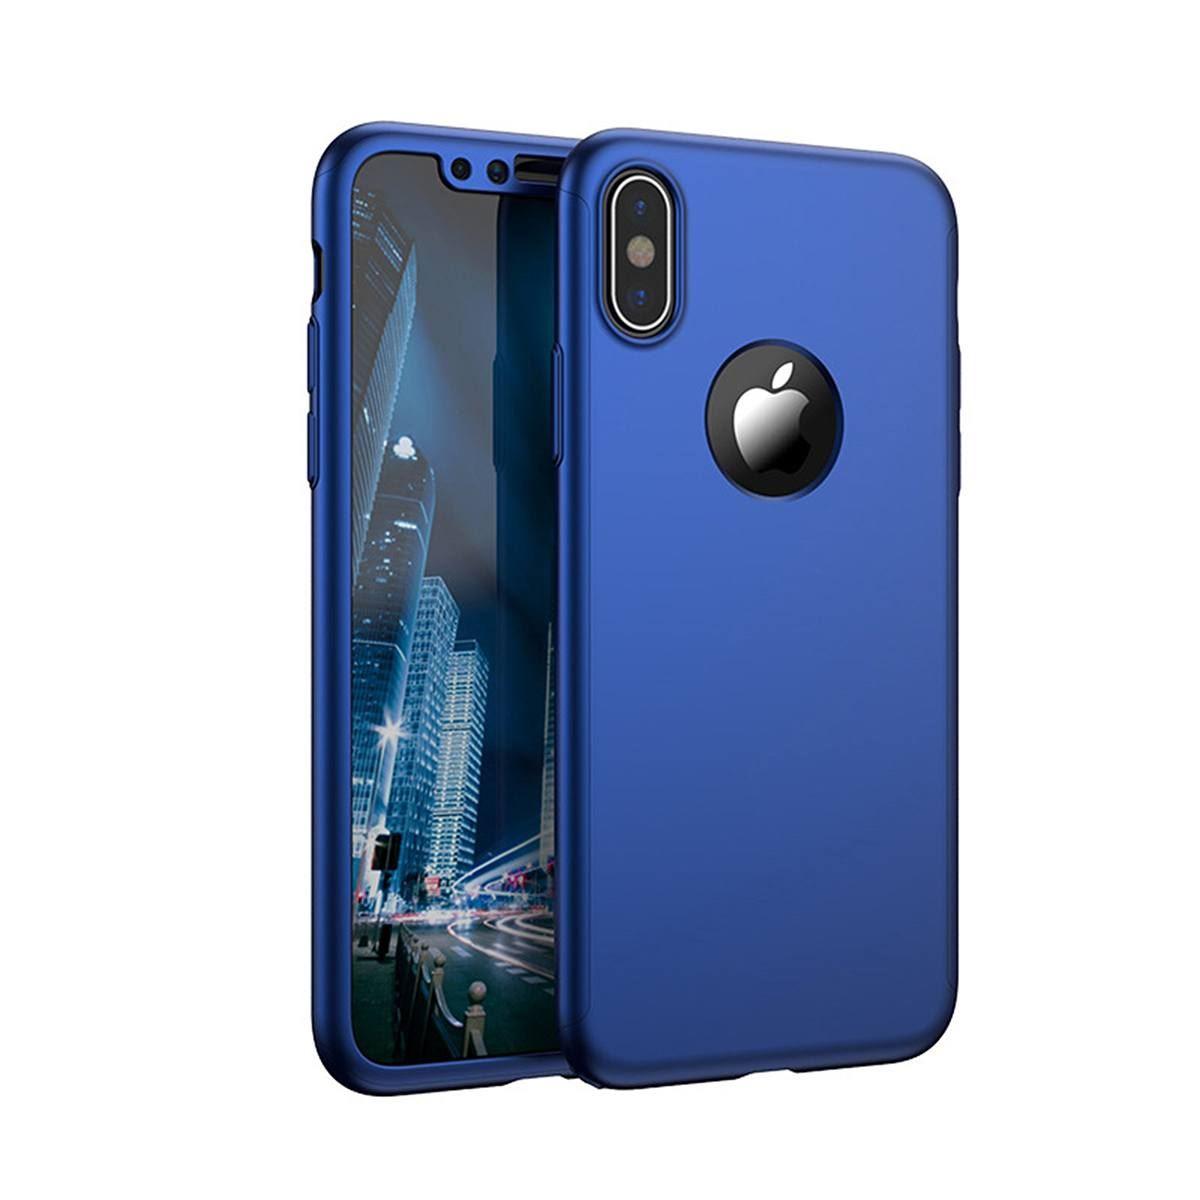 For-Apple-iPhone-XS-Max-XR-Hybrid-360-Slim-Ultra-Thin-Heavy-Duty-Shockproof-Case Indexbild 78